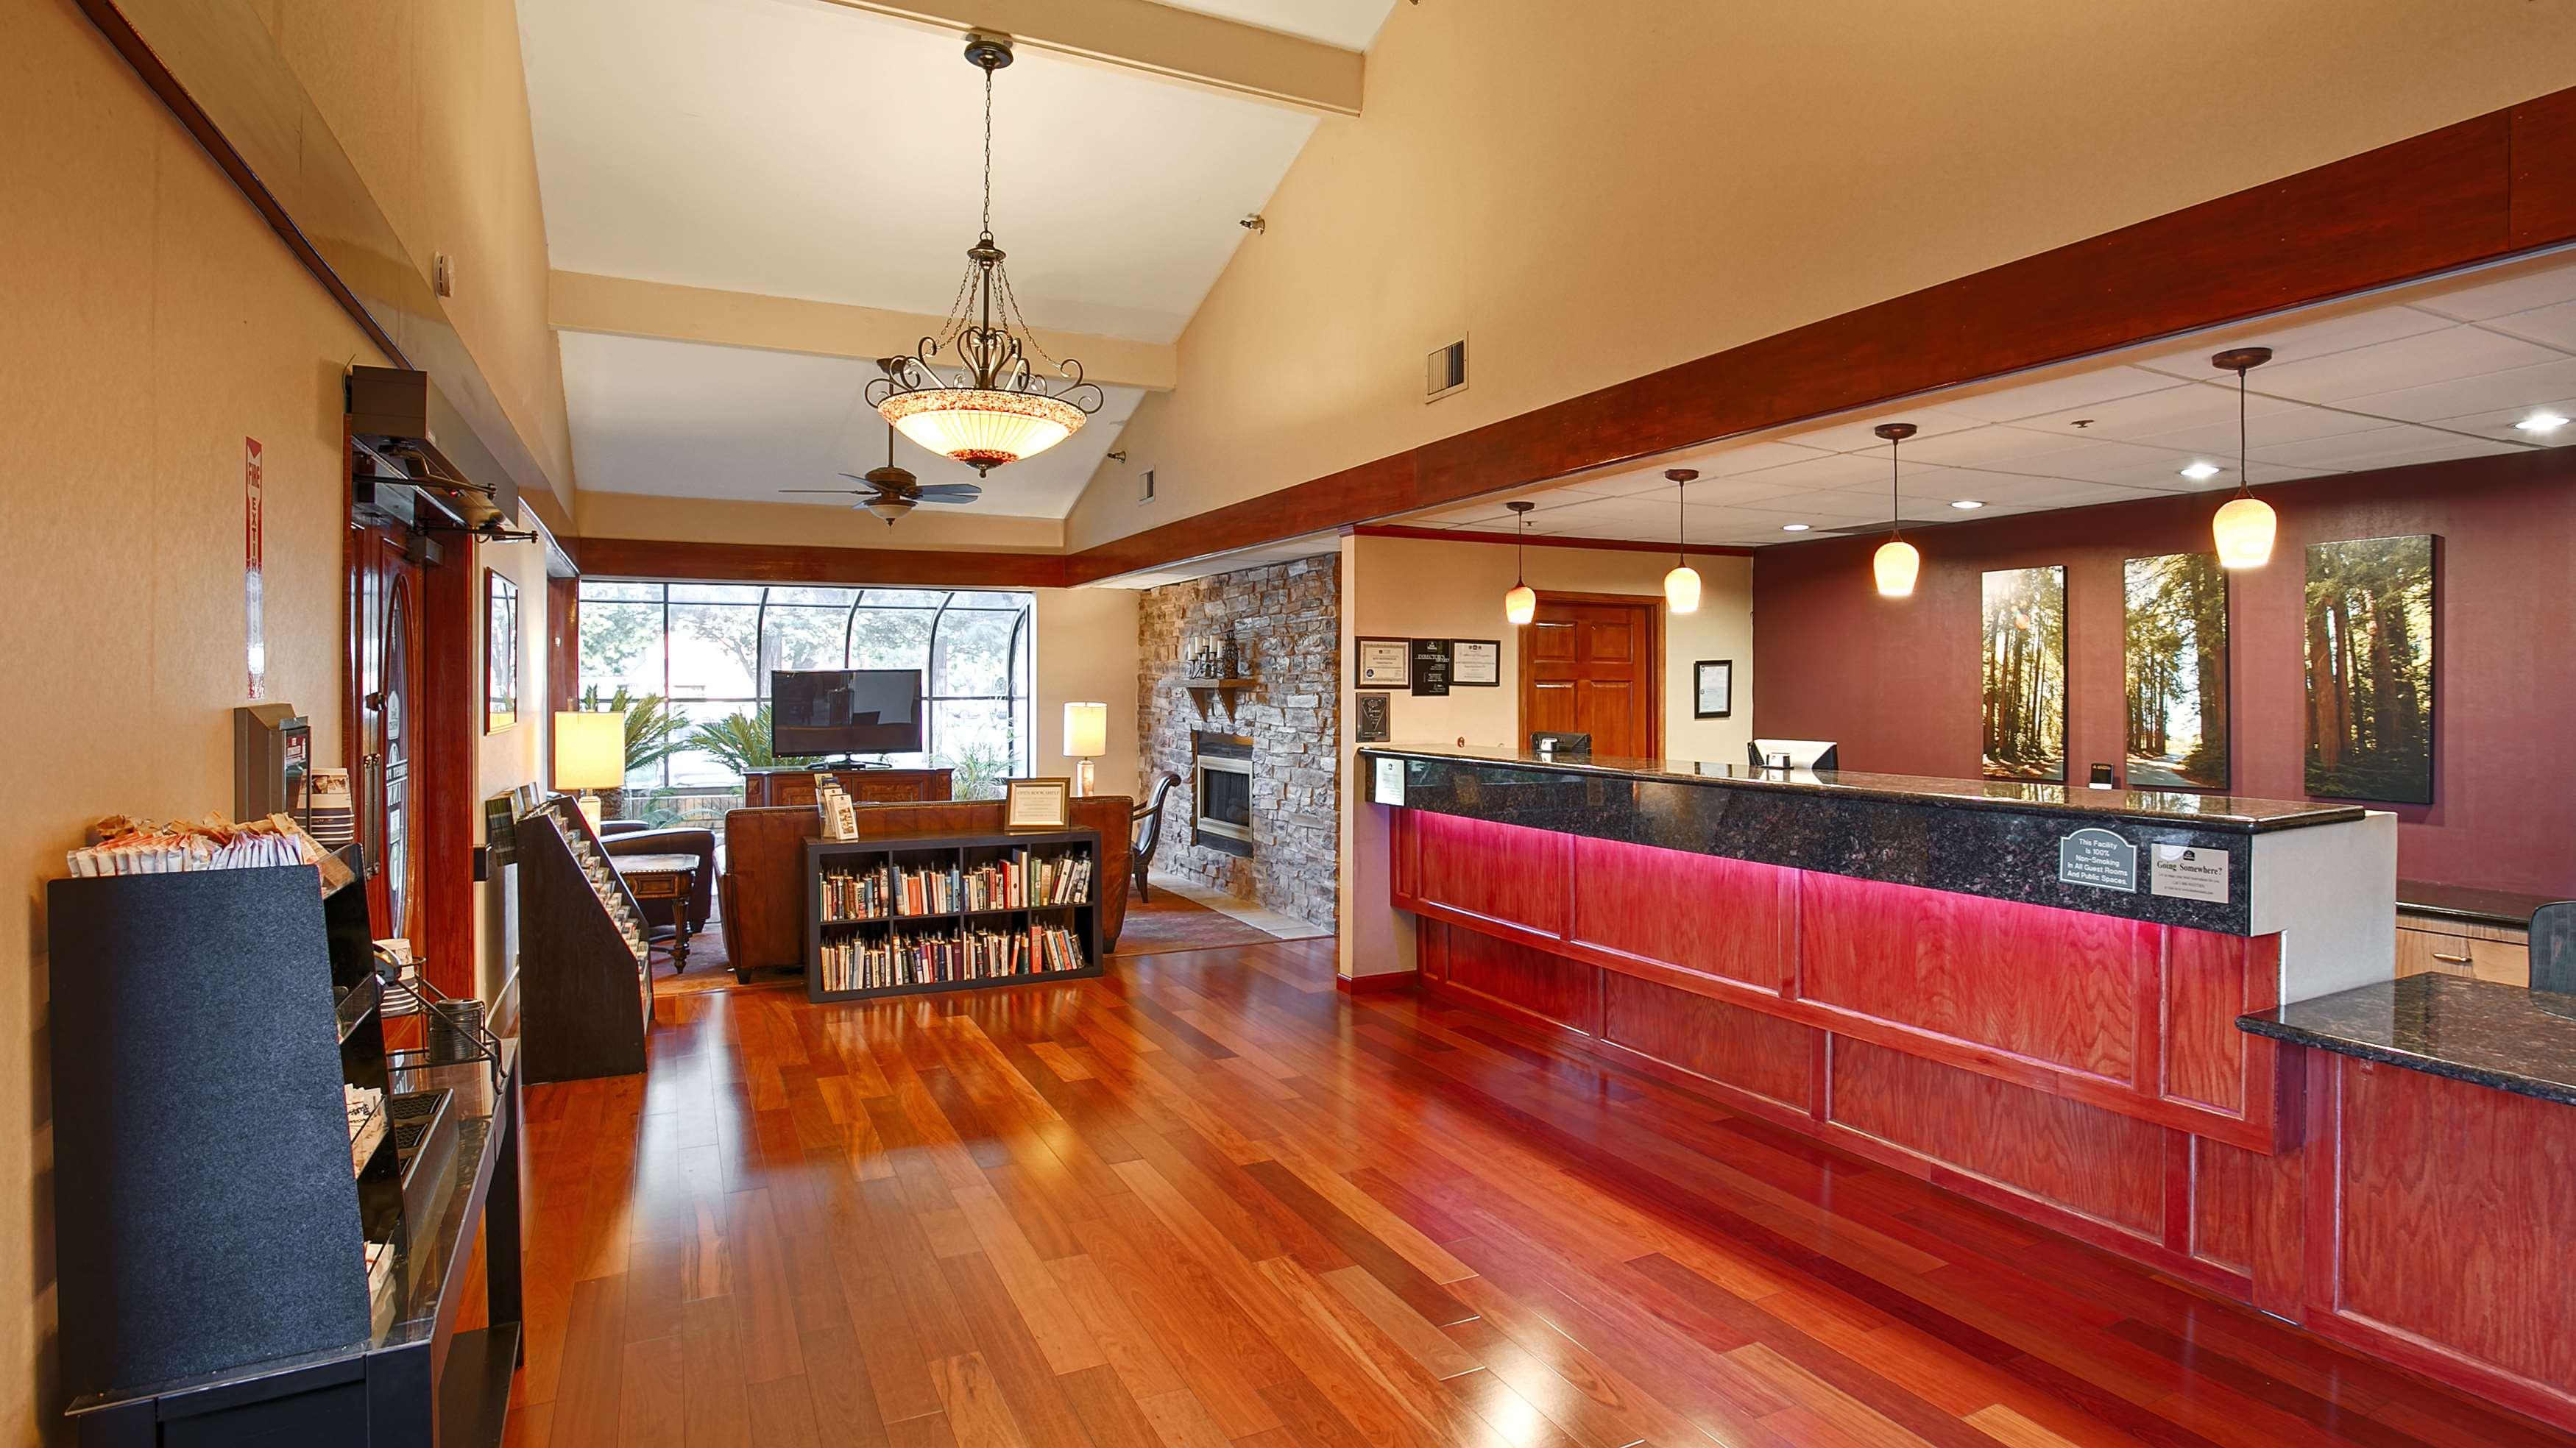 Best Western Plus Forest Park Inn image 6